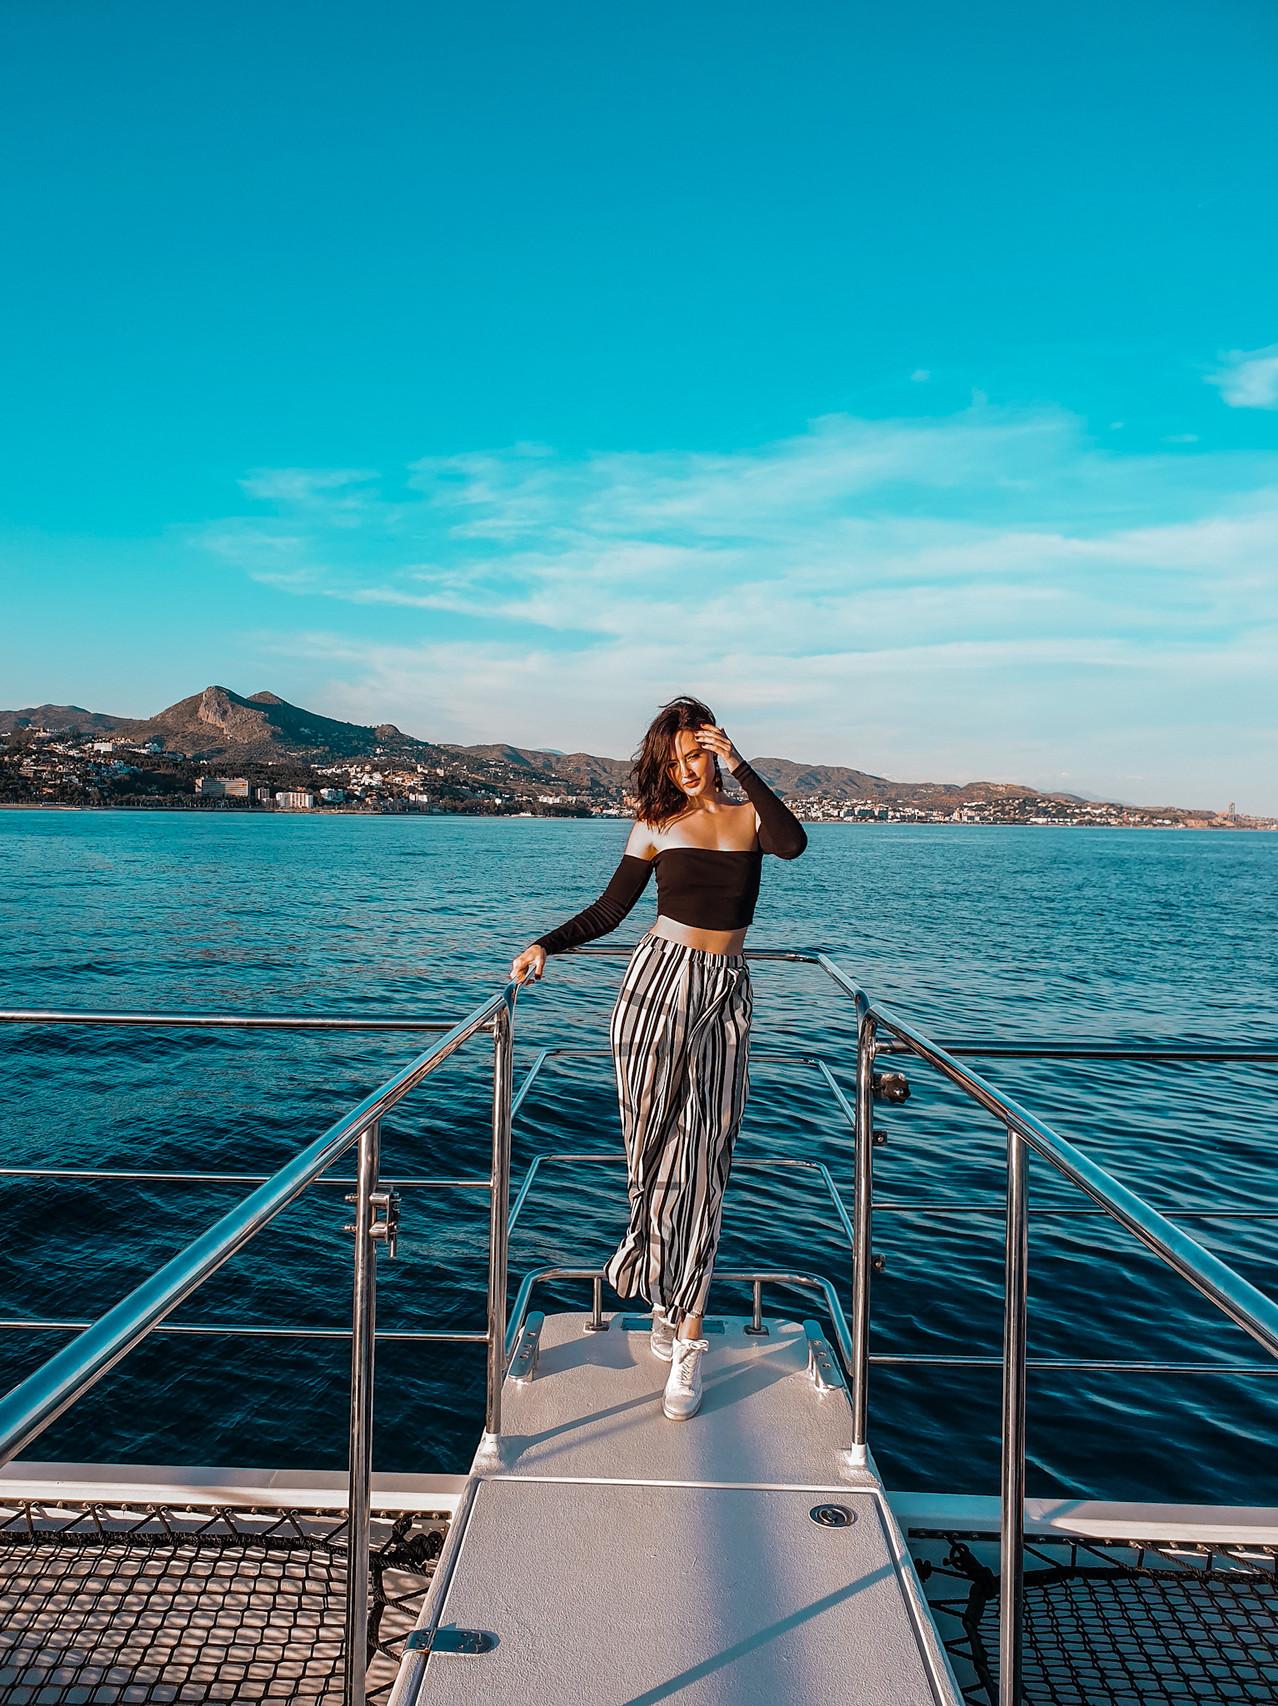 Sonnenuntergang / Sunset Malaga - Boottour Malaga - Olivia Libi